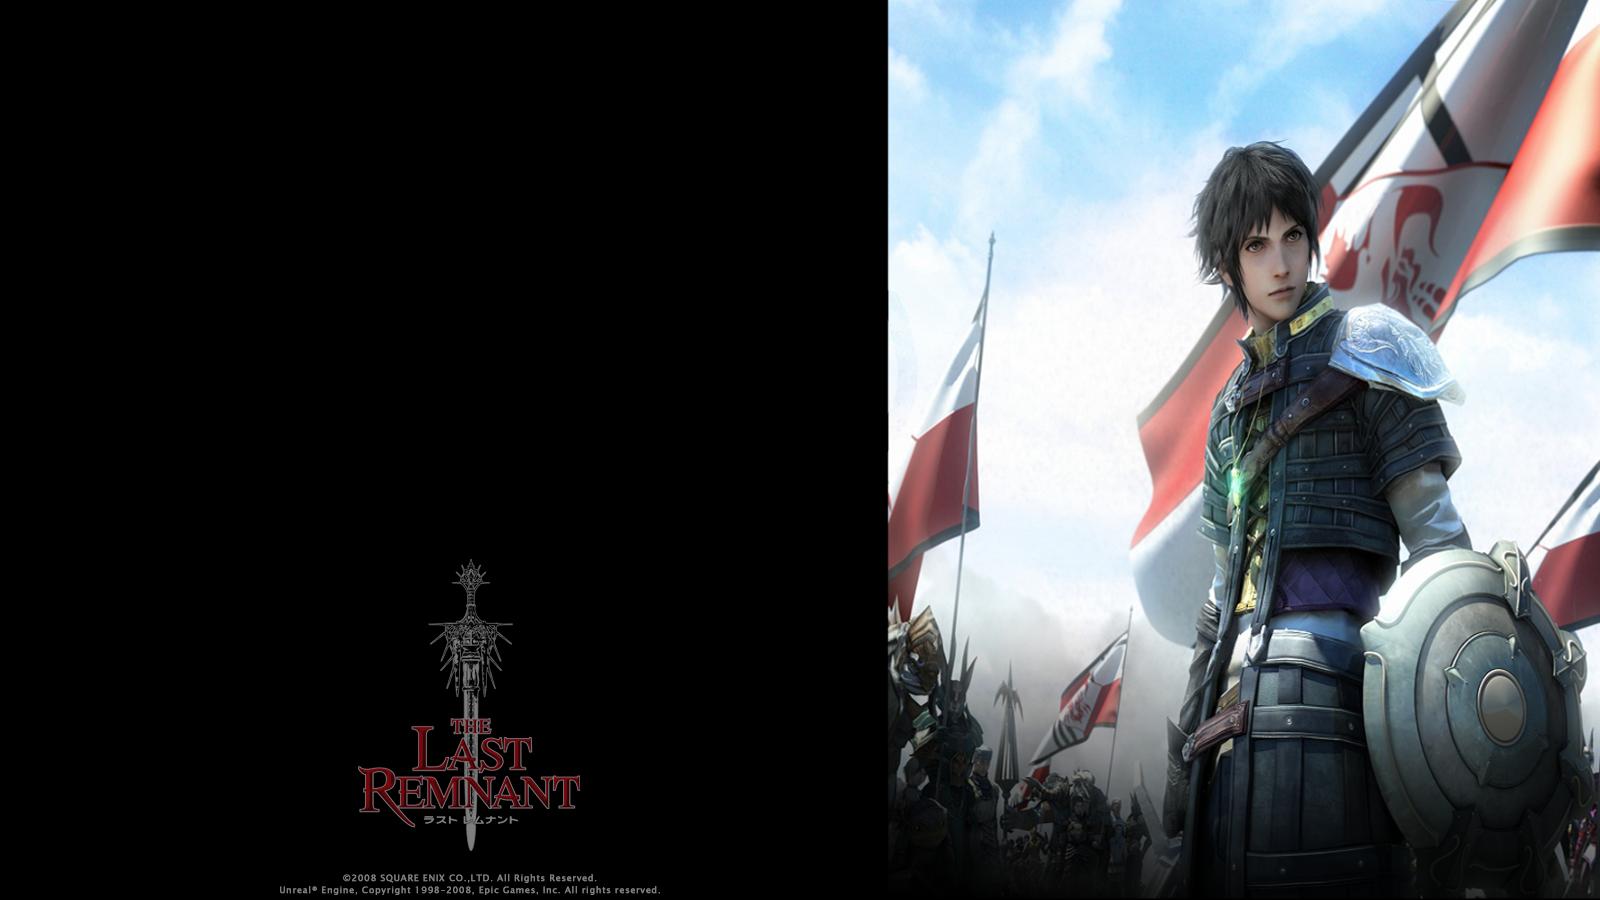 Video Game The Last Remnant Wallpaper Resolution 1600x900 Id Wallha Com